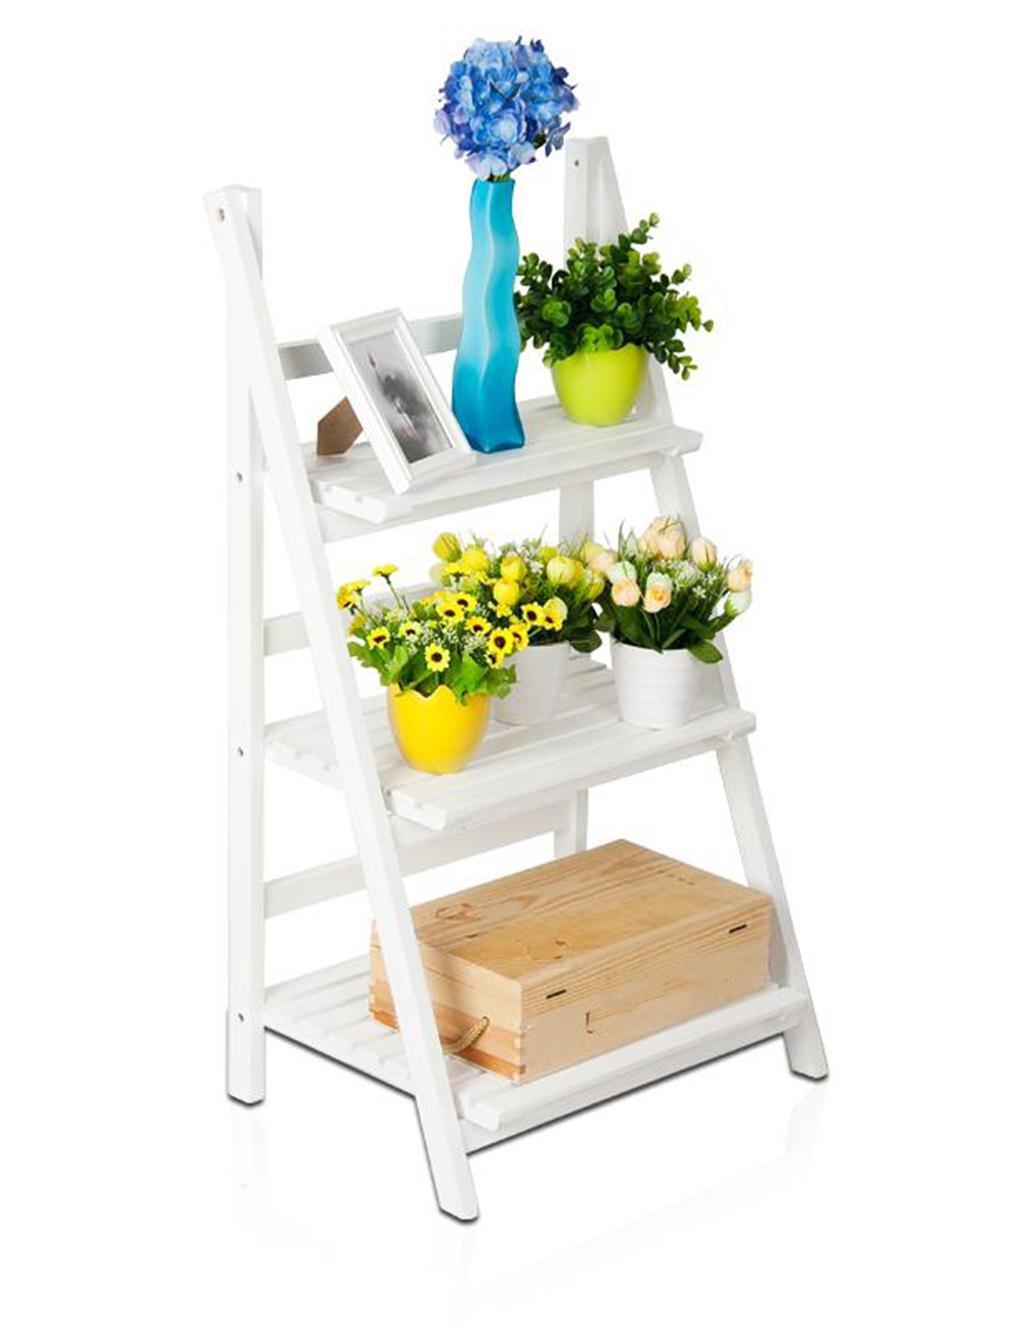 Dreistöckiger Massivholzboden-Blumen-Topf-Regal, Palnt Stand, Blumenregal, Faltregal, Weiß